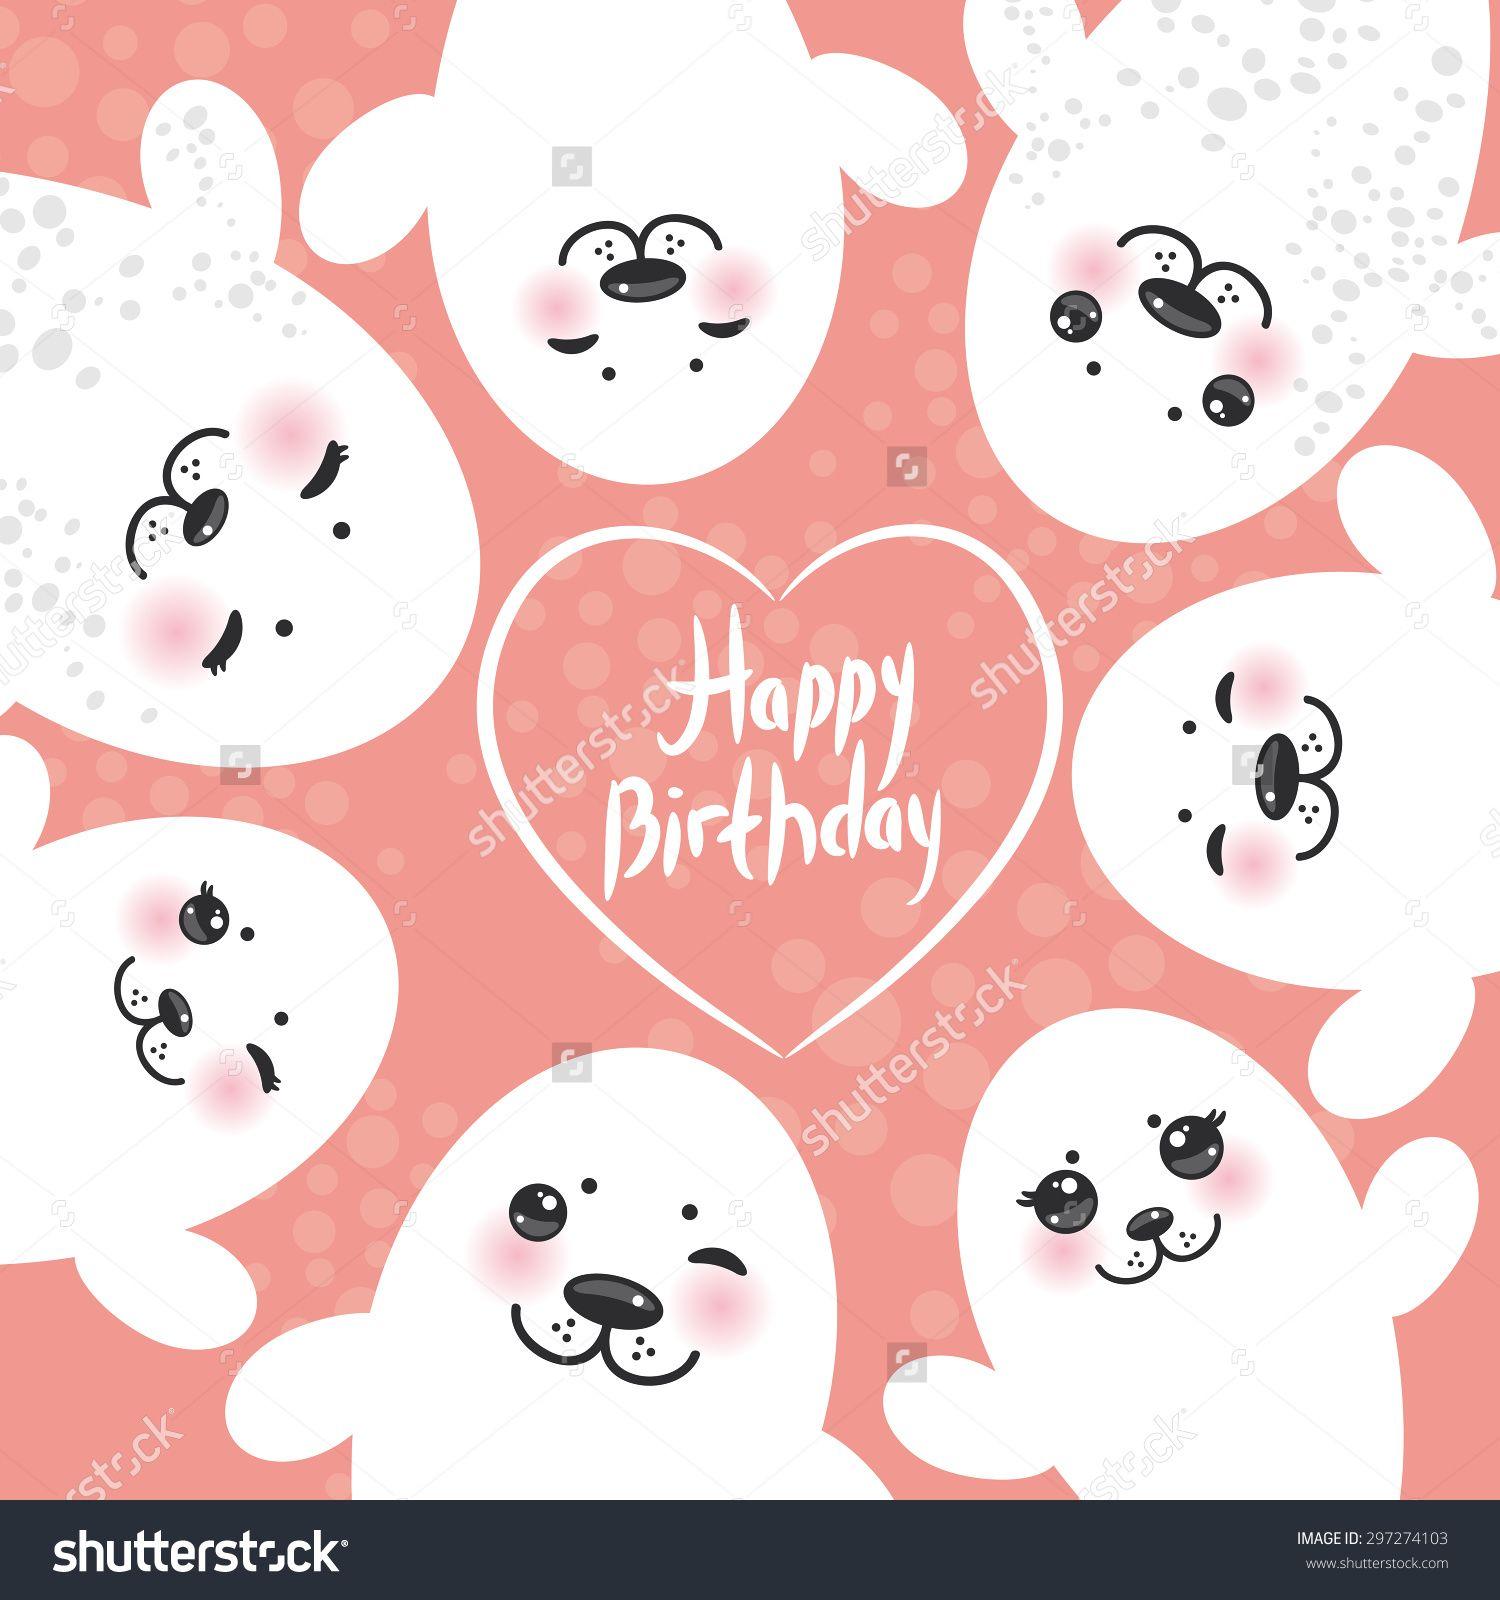 stockvectorhappybirthdaycarddesignfunnywhitefursealpups – Cute Happy Birthday Cards